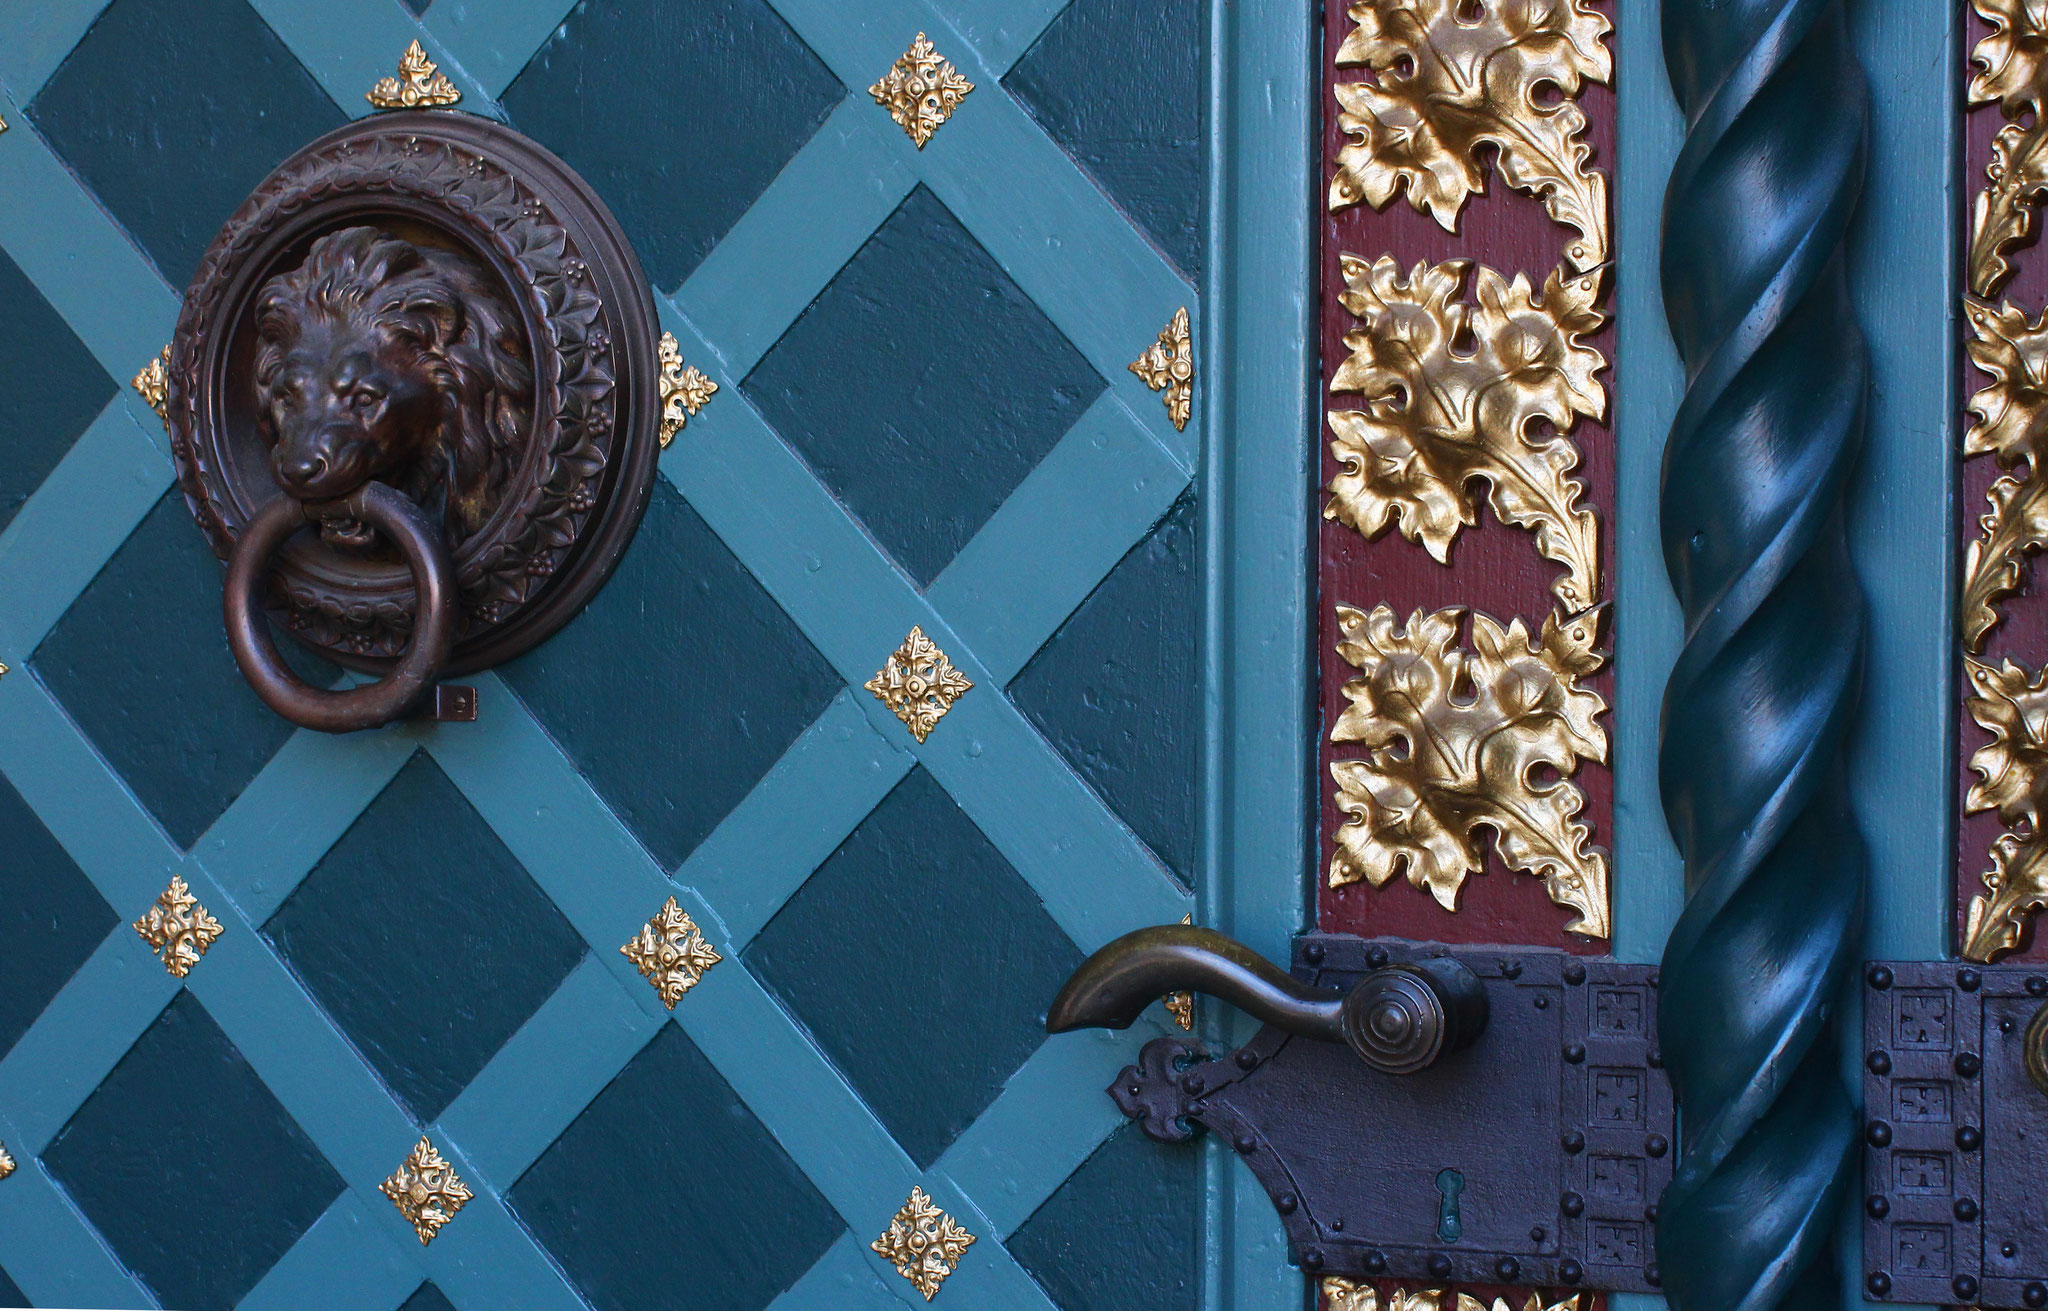 Alhambra in Minden. (c) Doris Rohde, 2017.